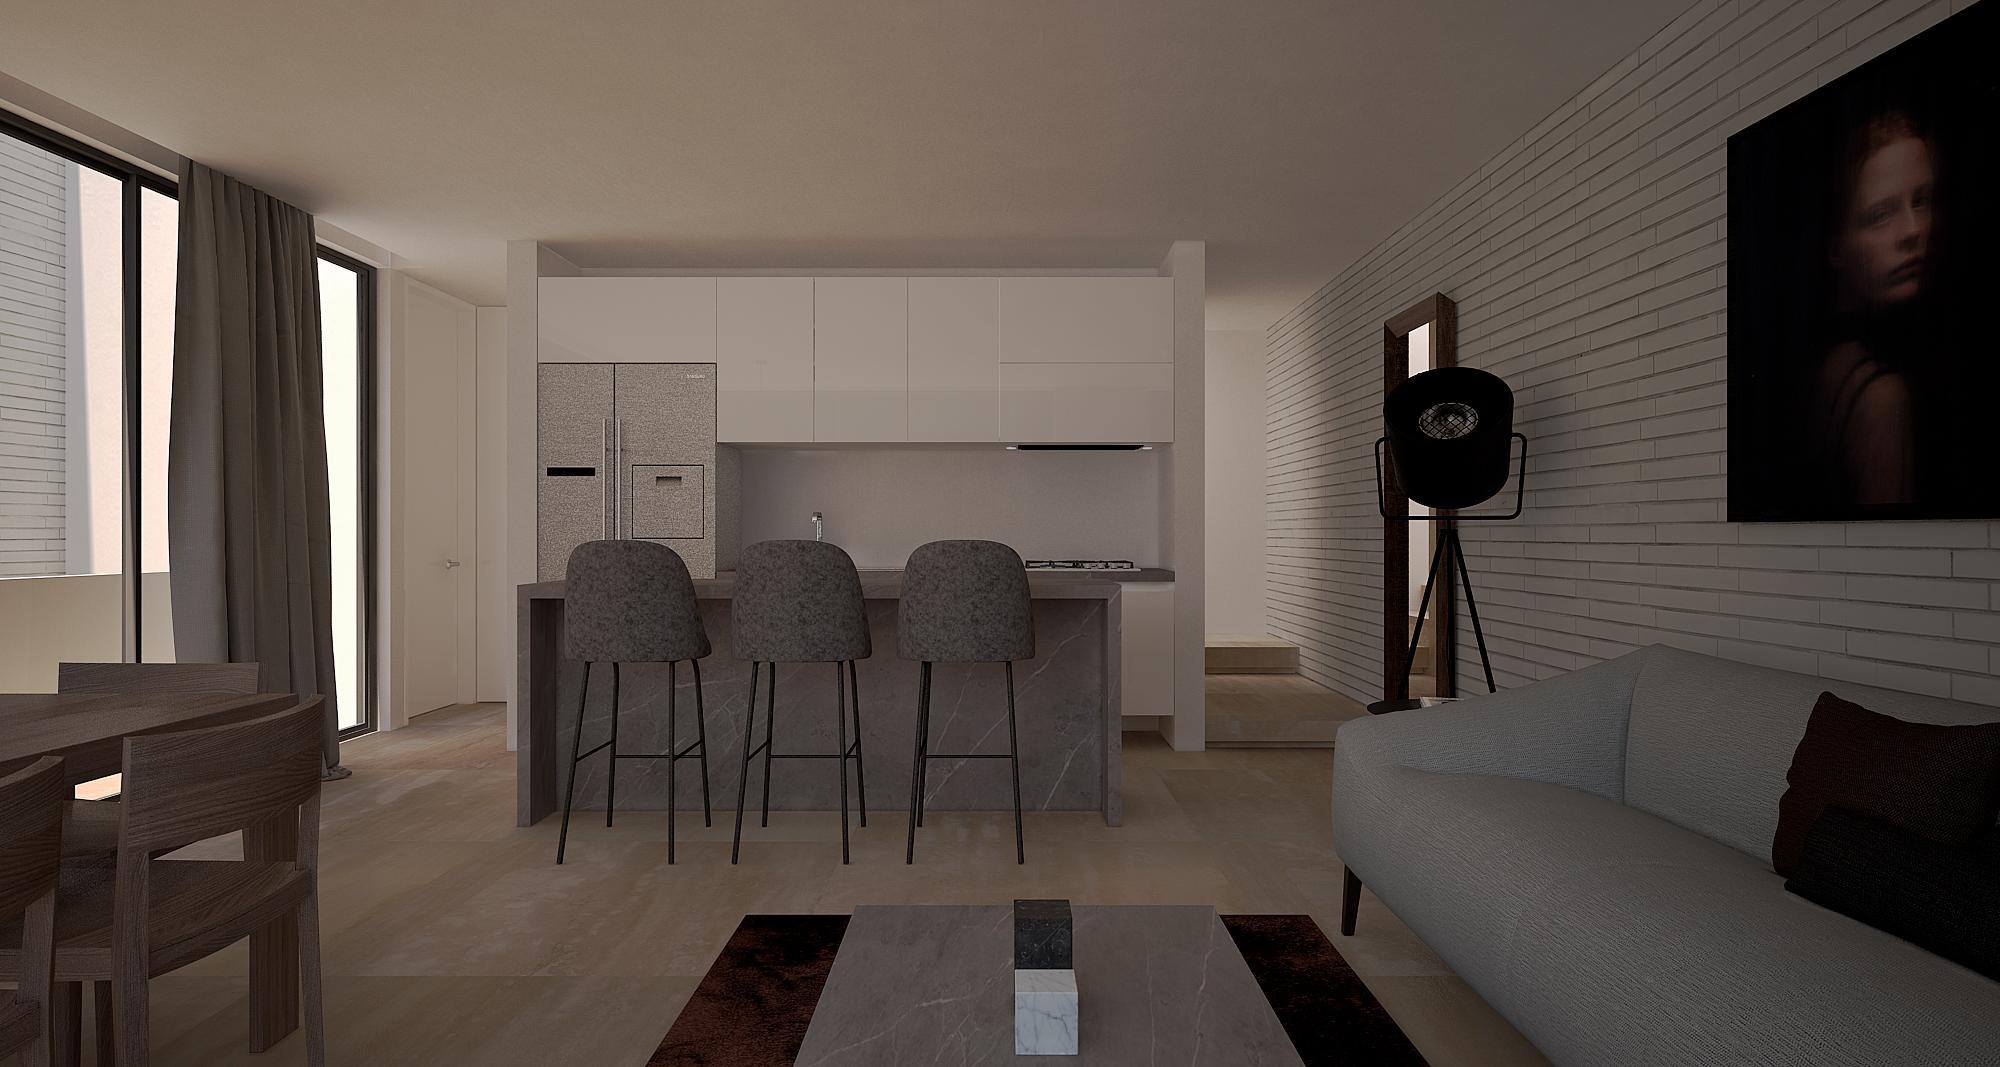 Casas Siamesas - 02